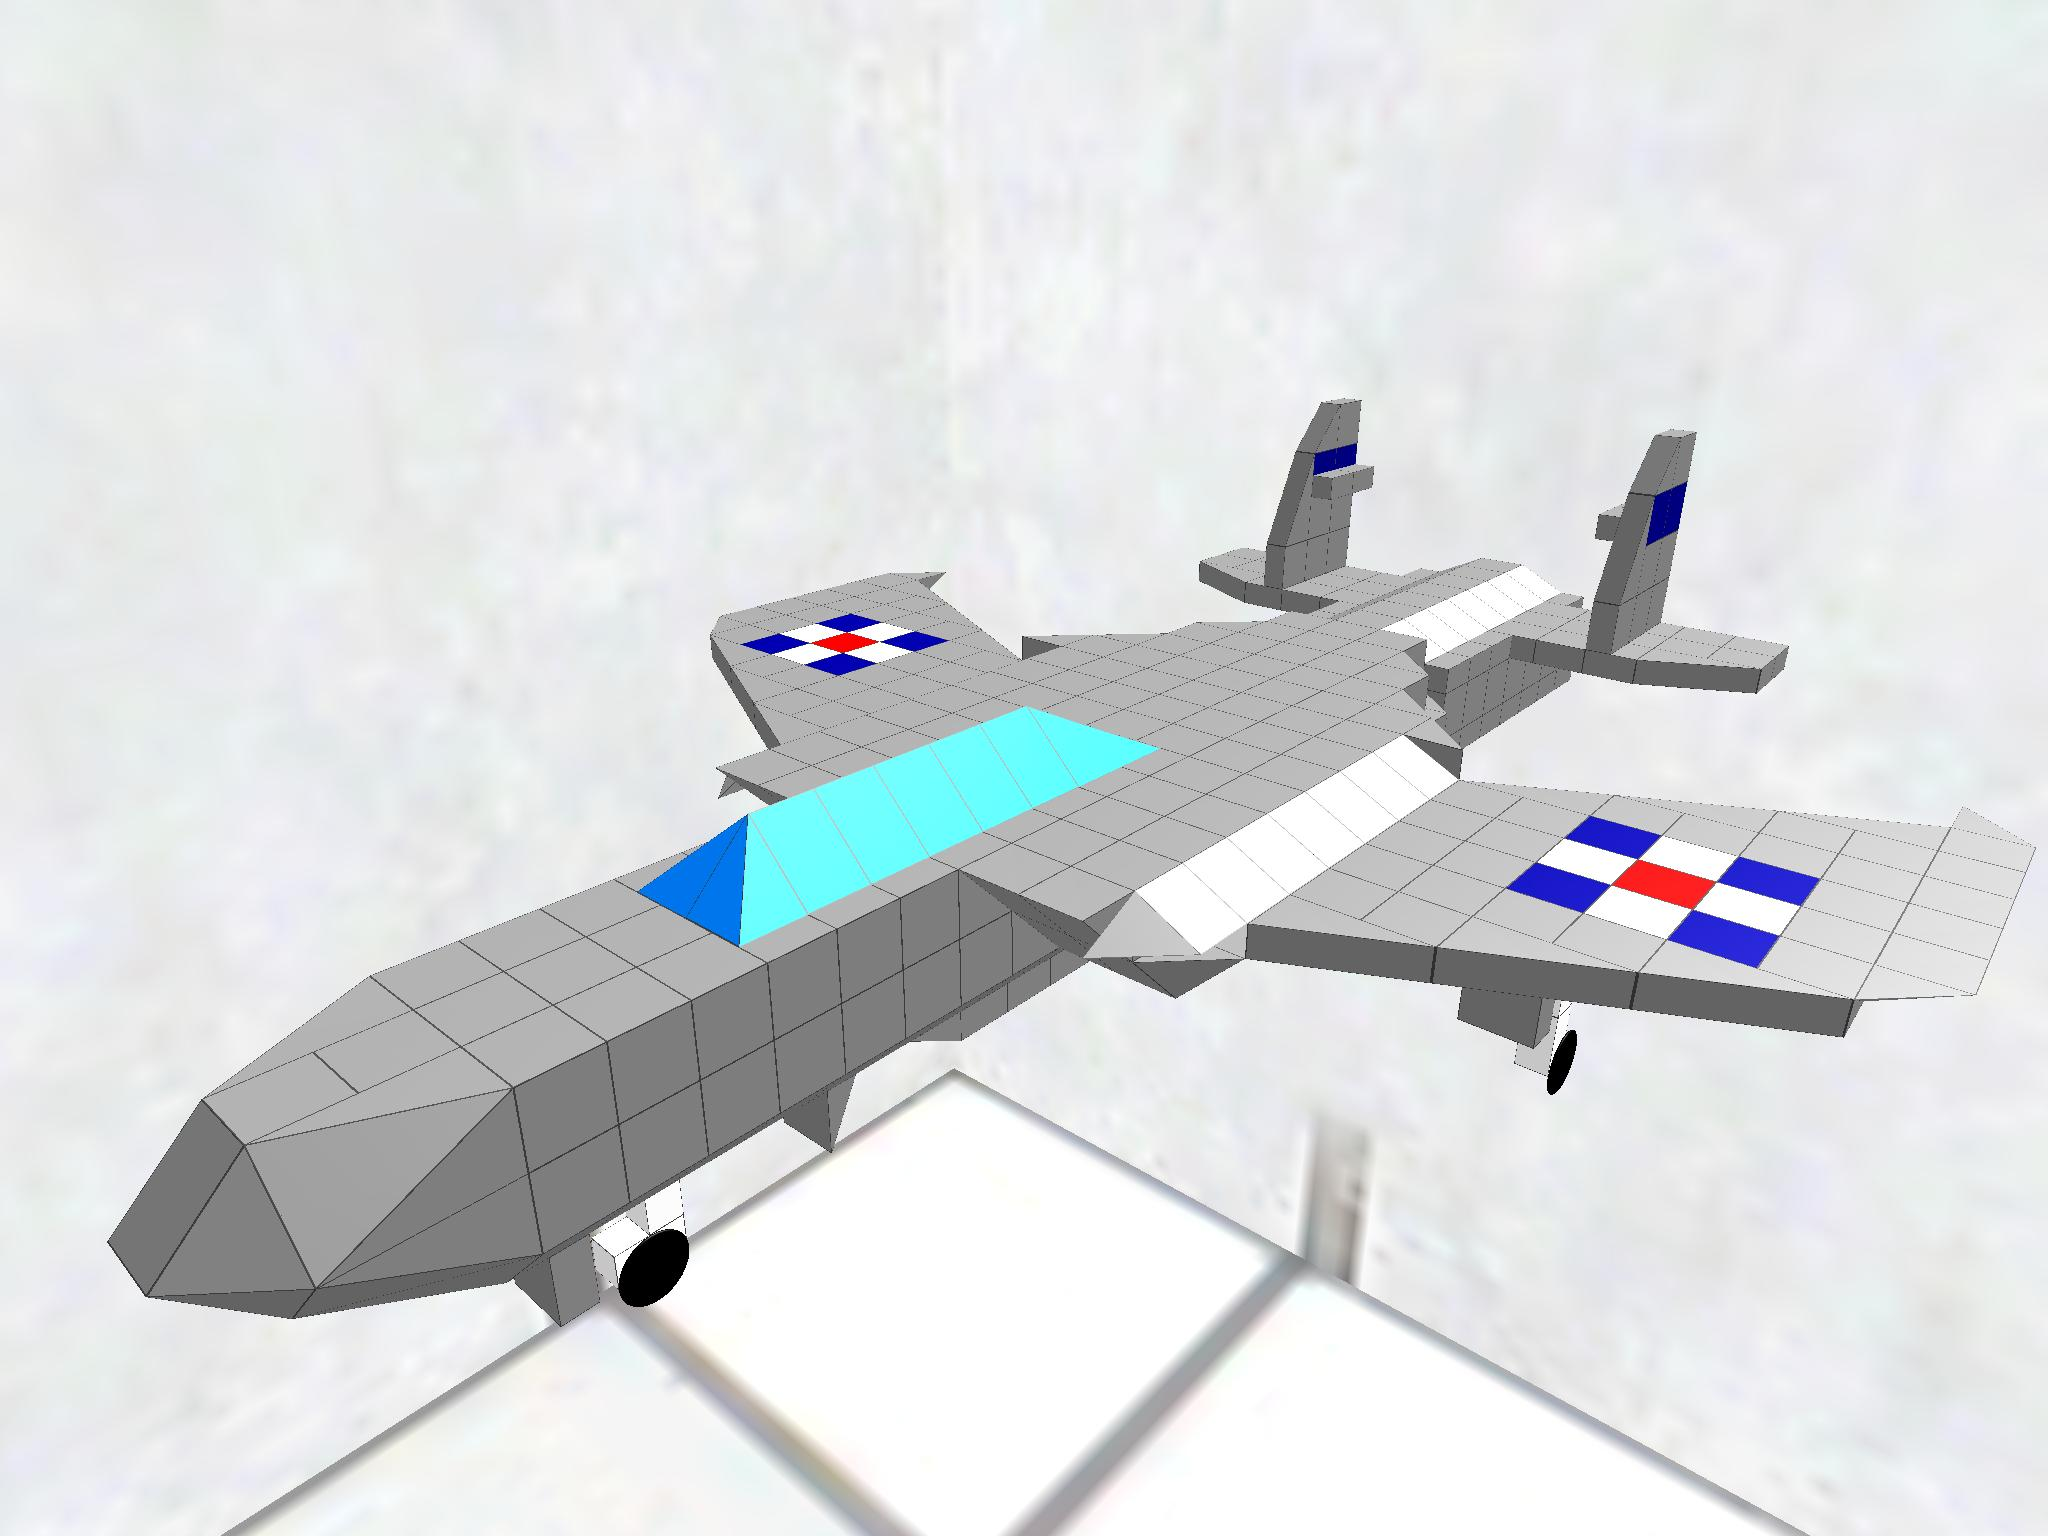 STRF-11L